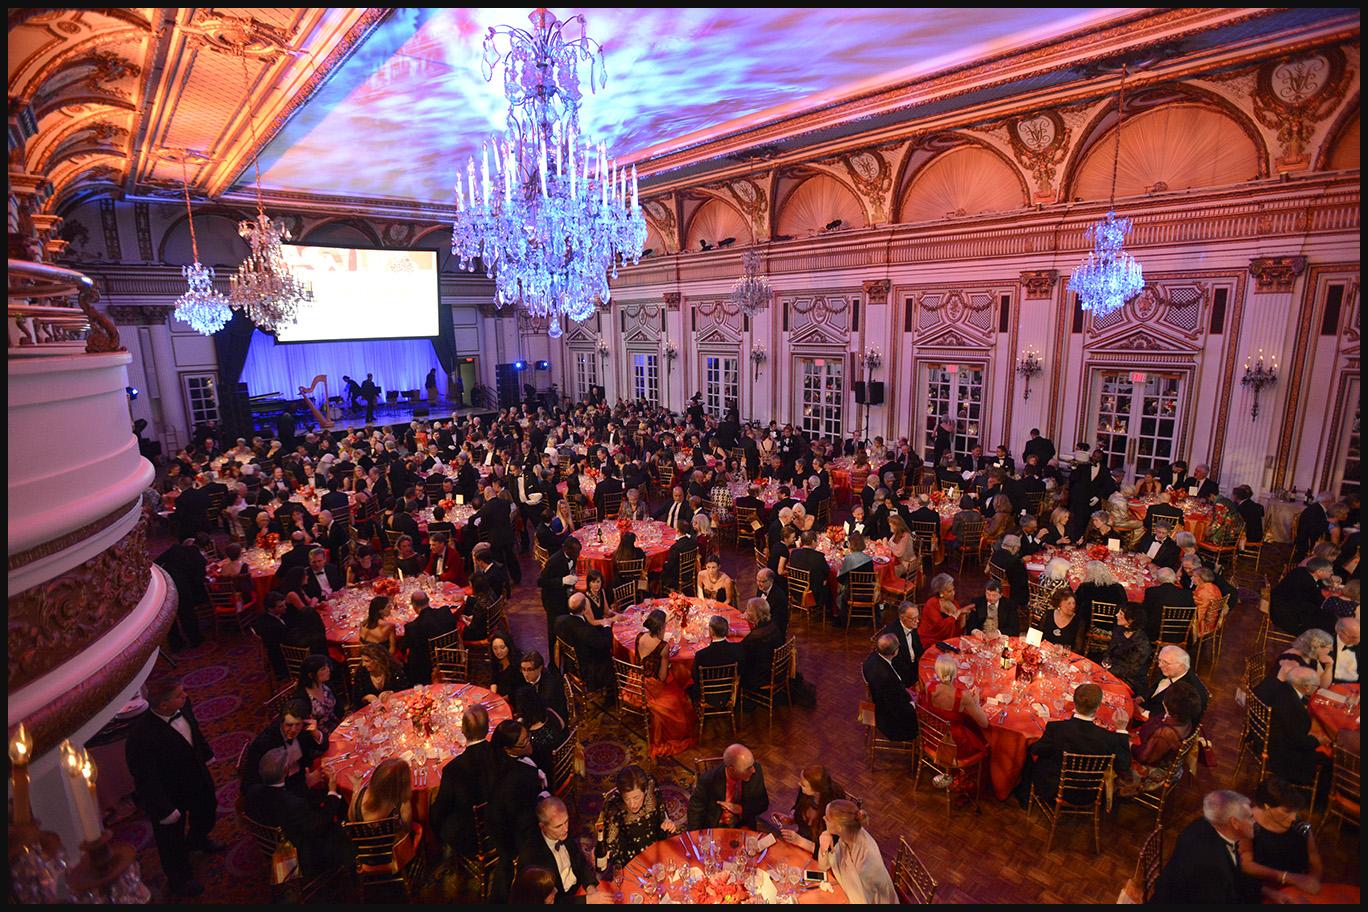 New England Conservatory Gala